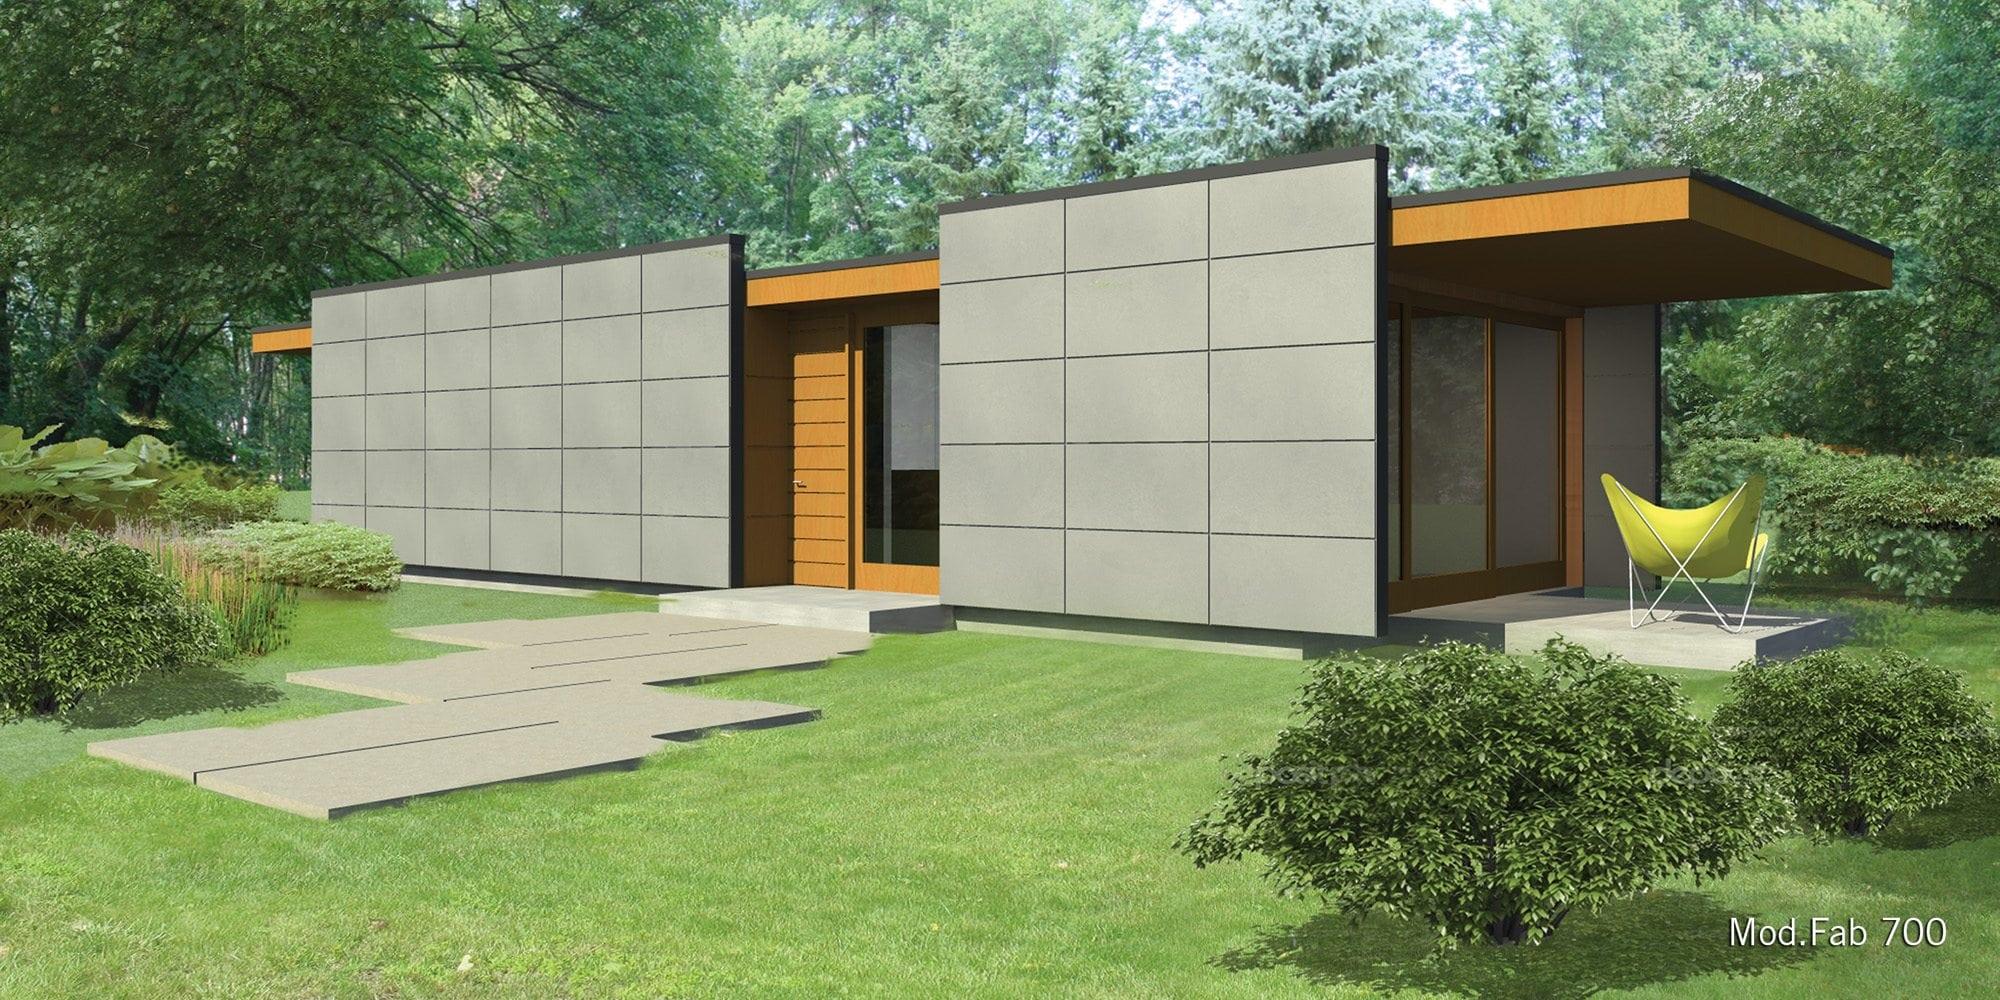 Mod Fab 700 Lindal Cedar Homes